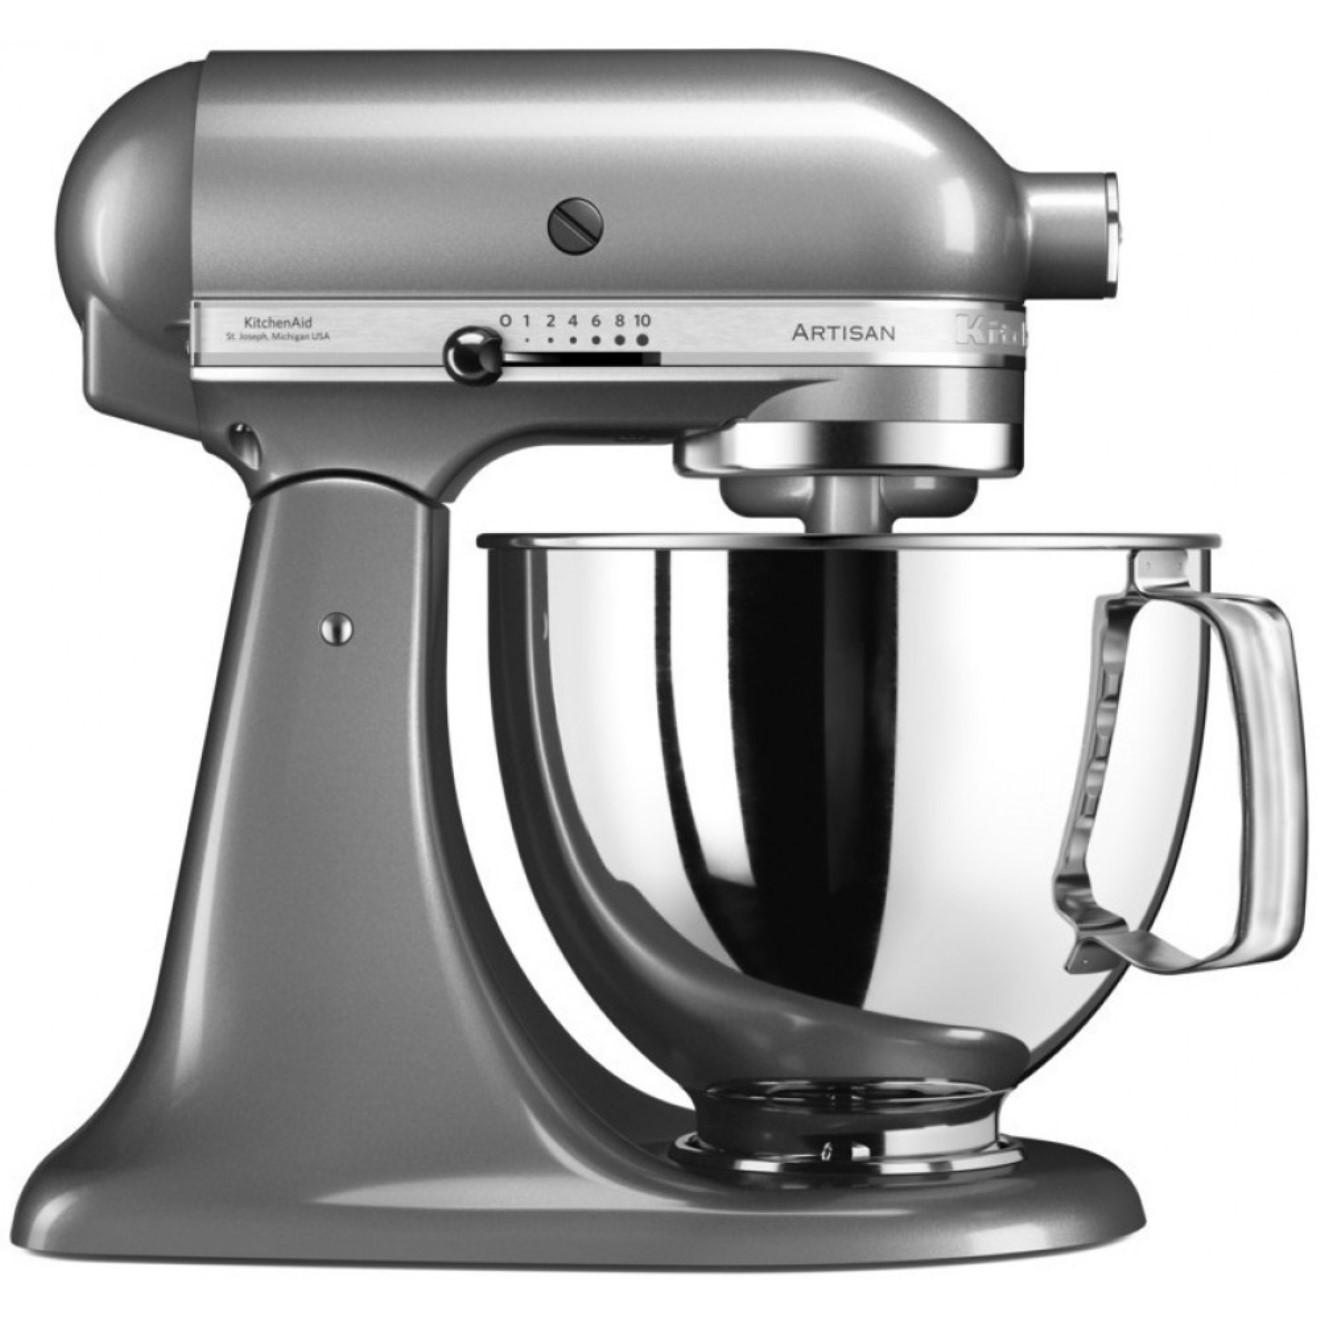 Онлайн каталог PROMENU: Миксер планетарный KitchenAid Artisan, объем чаши 4,83 л, серебристый                  KitchenAid 5KSM125ECU